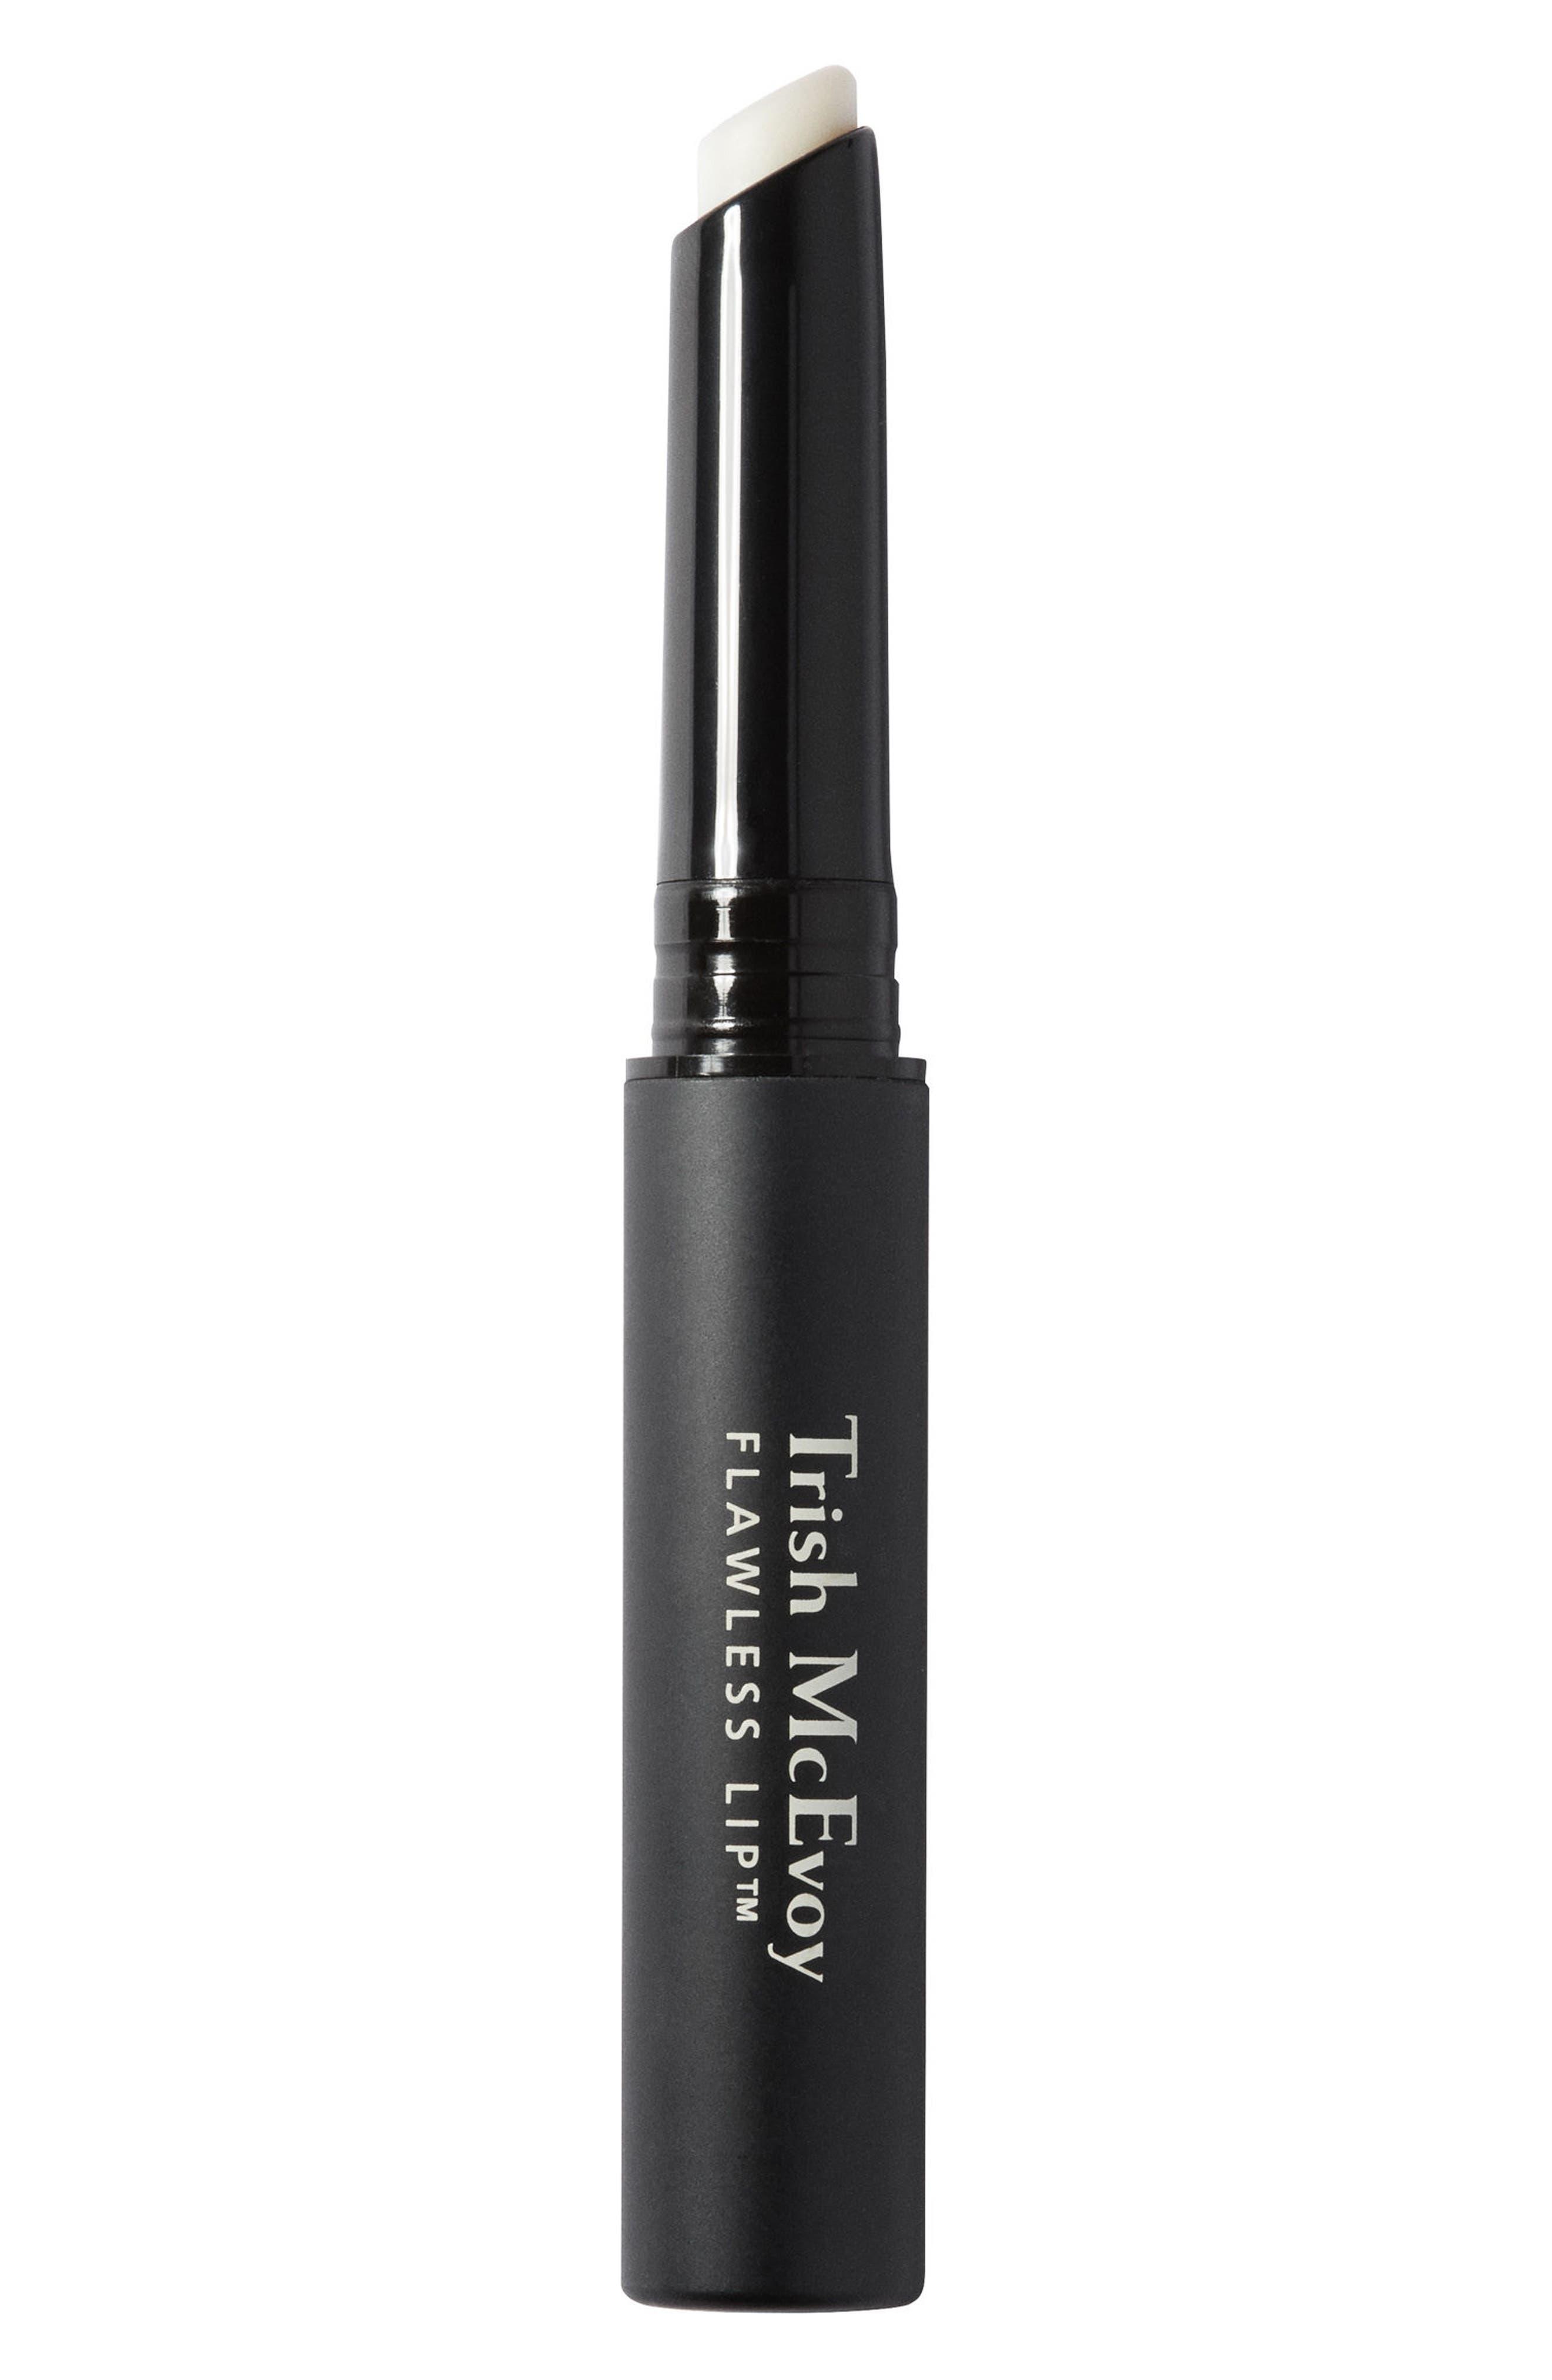 Trish McEvoy Flawless Lip Primer